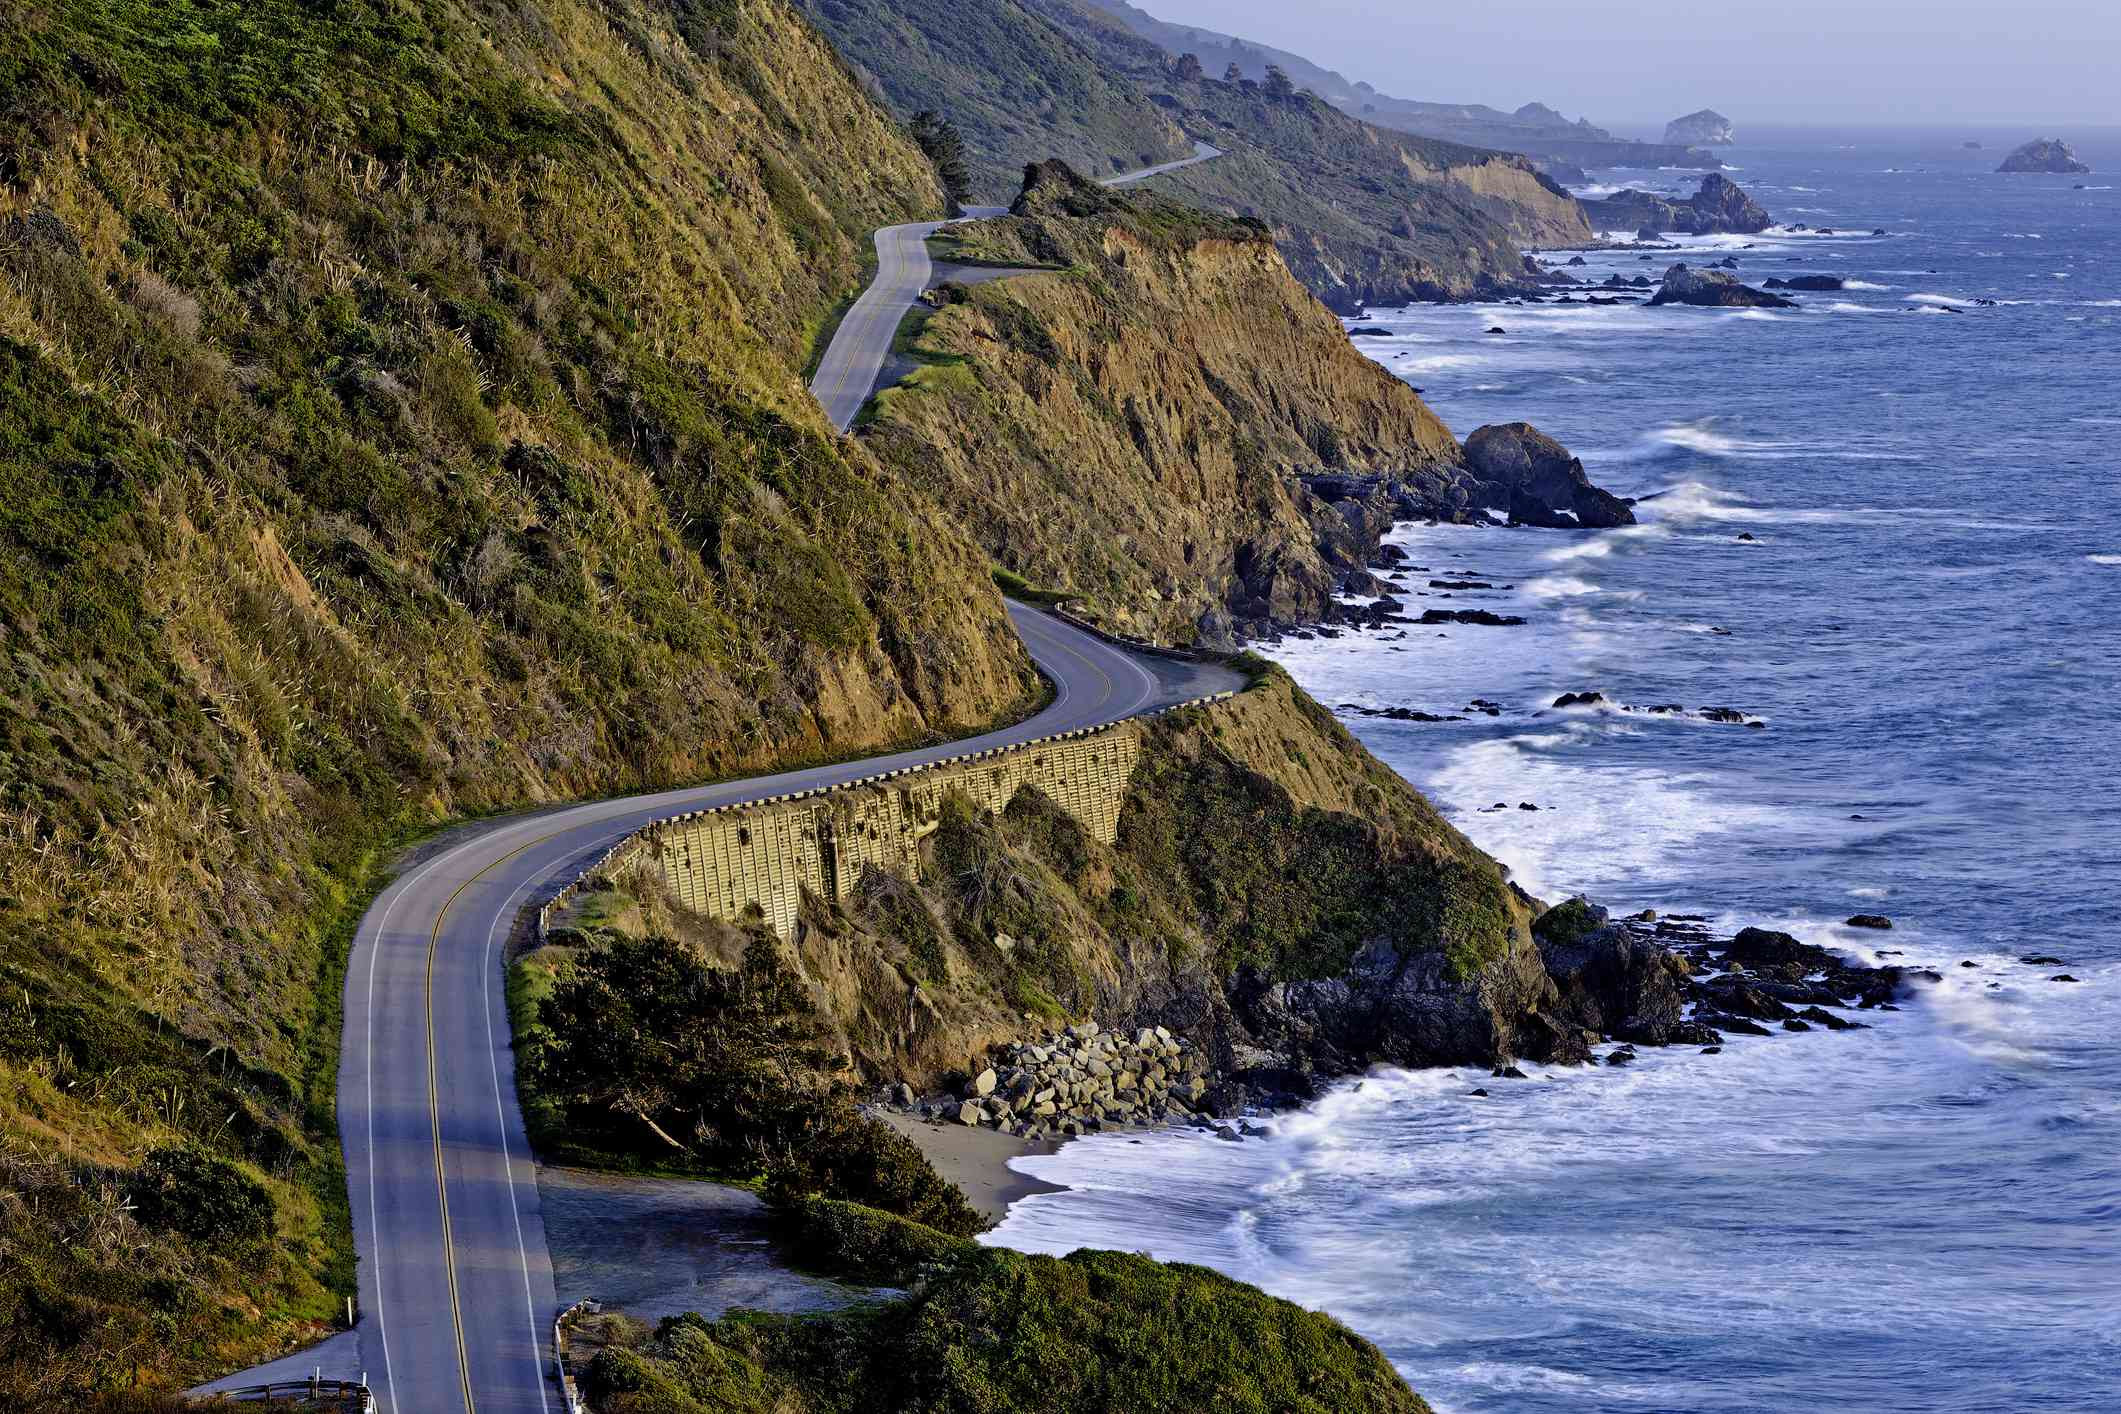 Pacific Coast Highway running along rocky coast at sunset